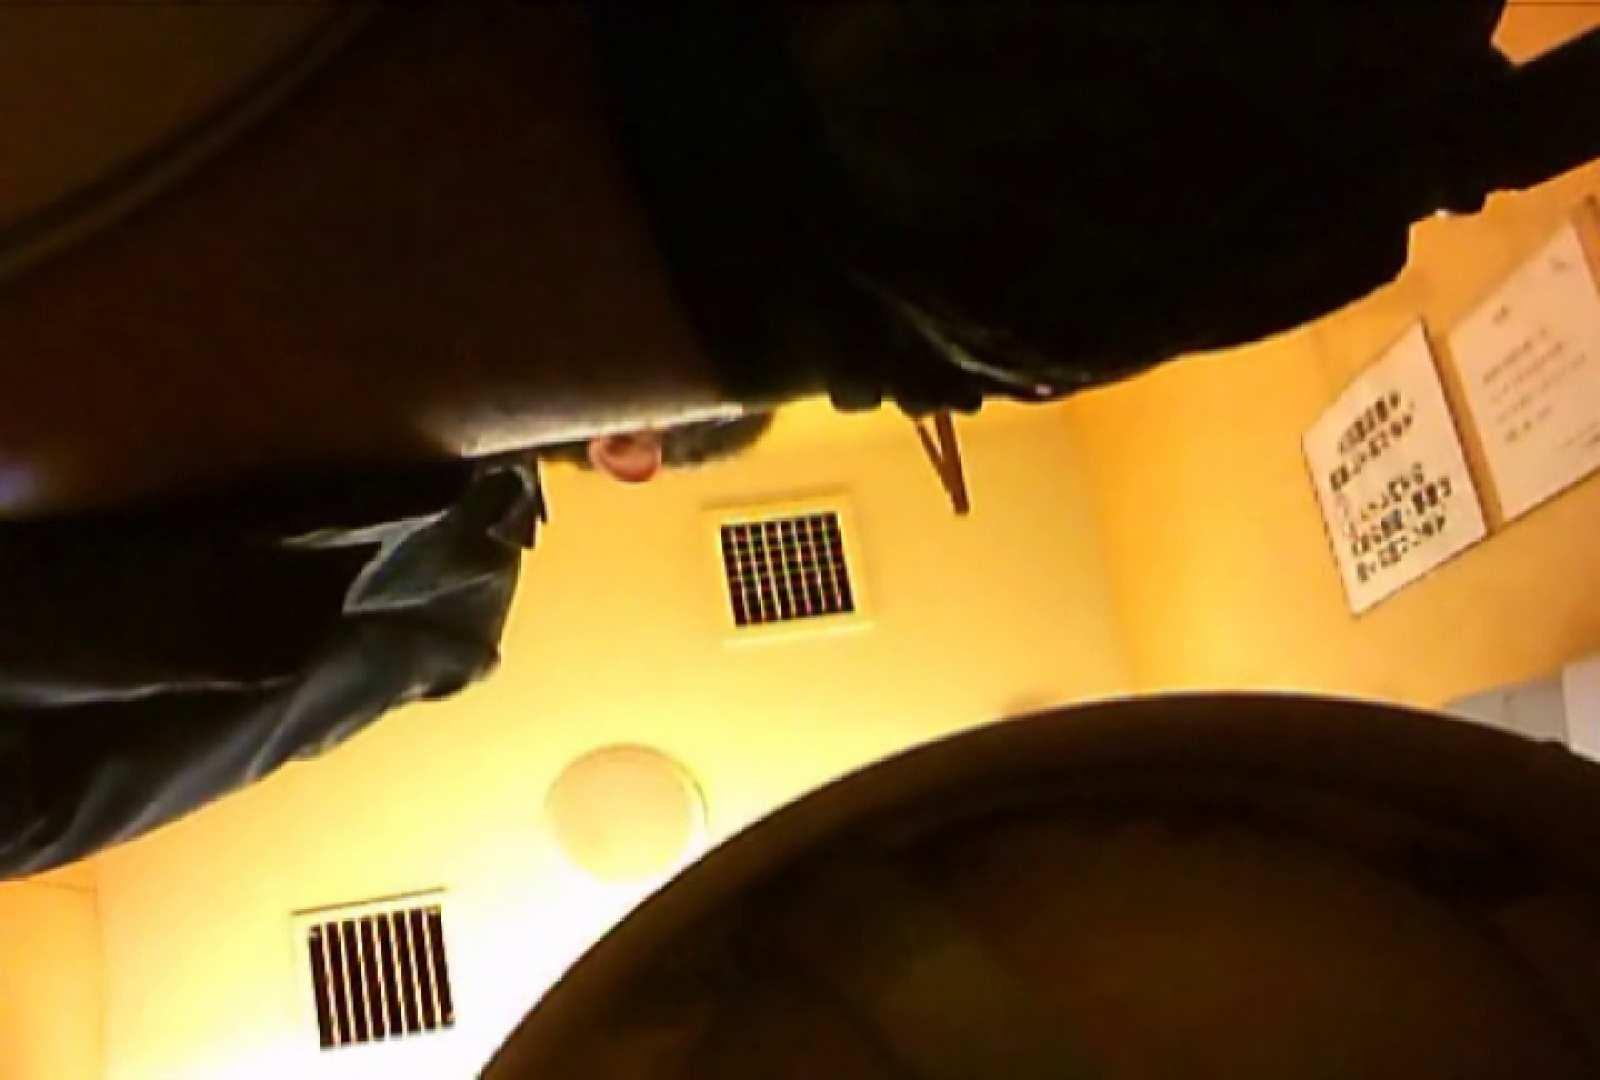 SEASON 2ND!掴み取りさんの洗面所覗き!in新幹線!VOL.02 スーツボーイズ | ノンケボーイズ  82pic 11